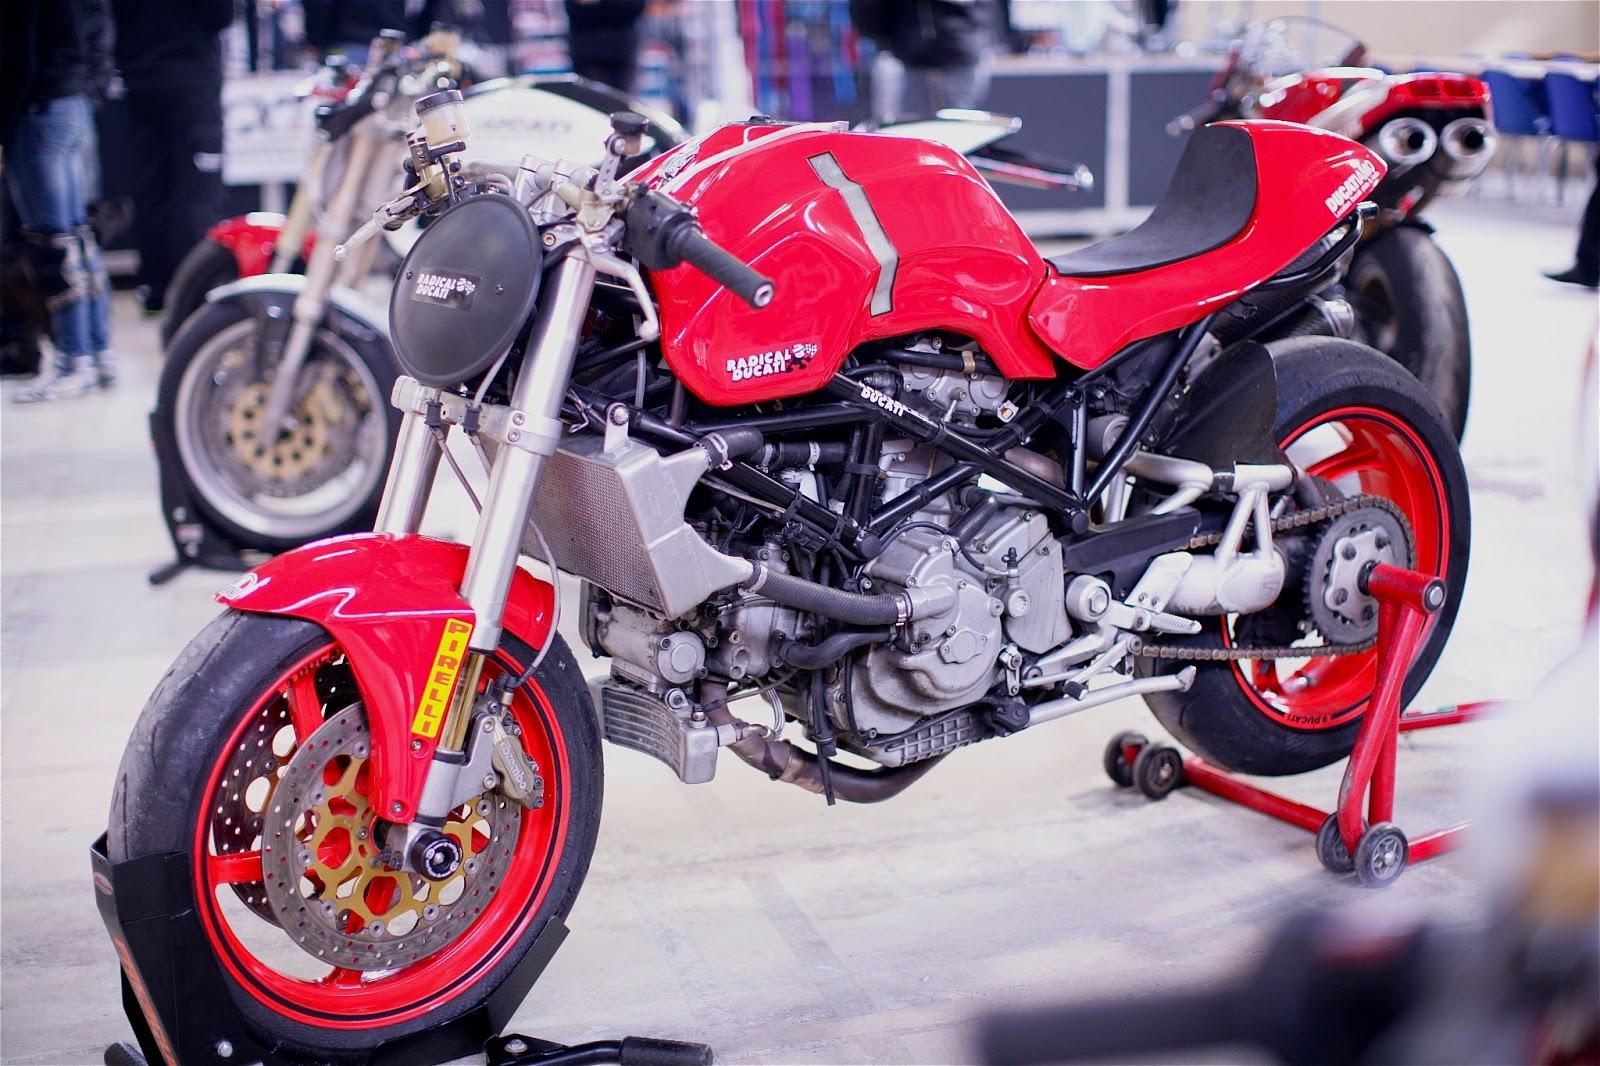 MANX DUCATIAMO sur la base de un S4R :: Radical Ducati S.L.